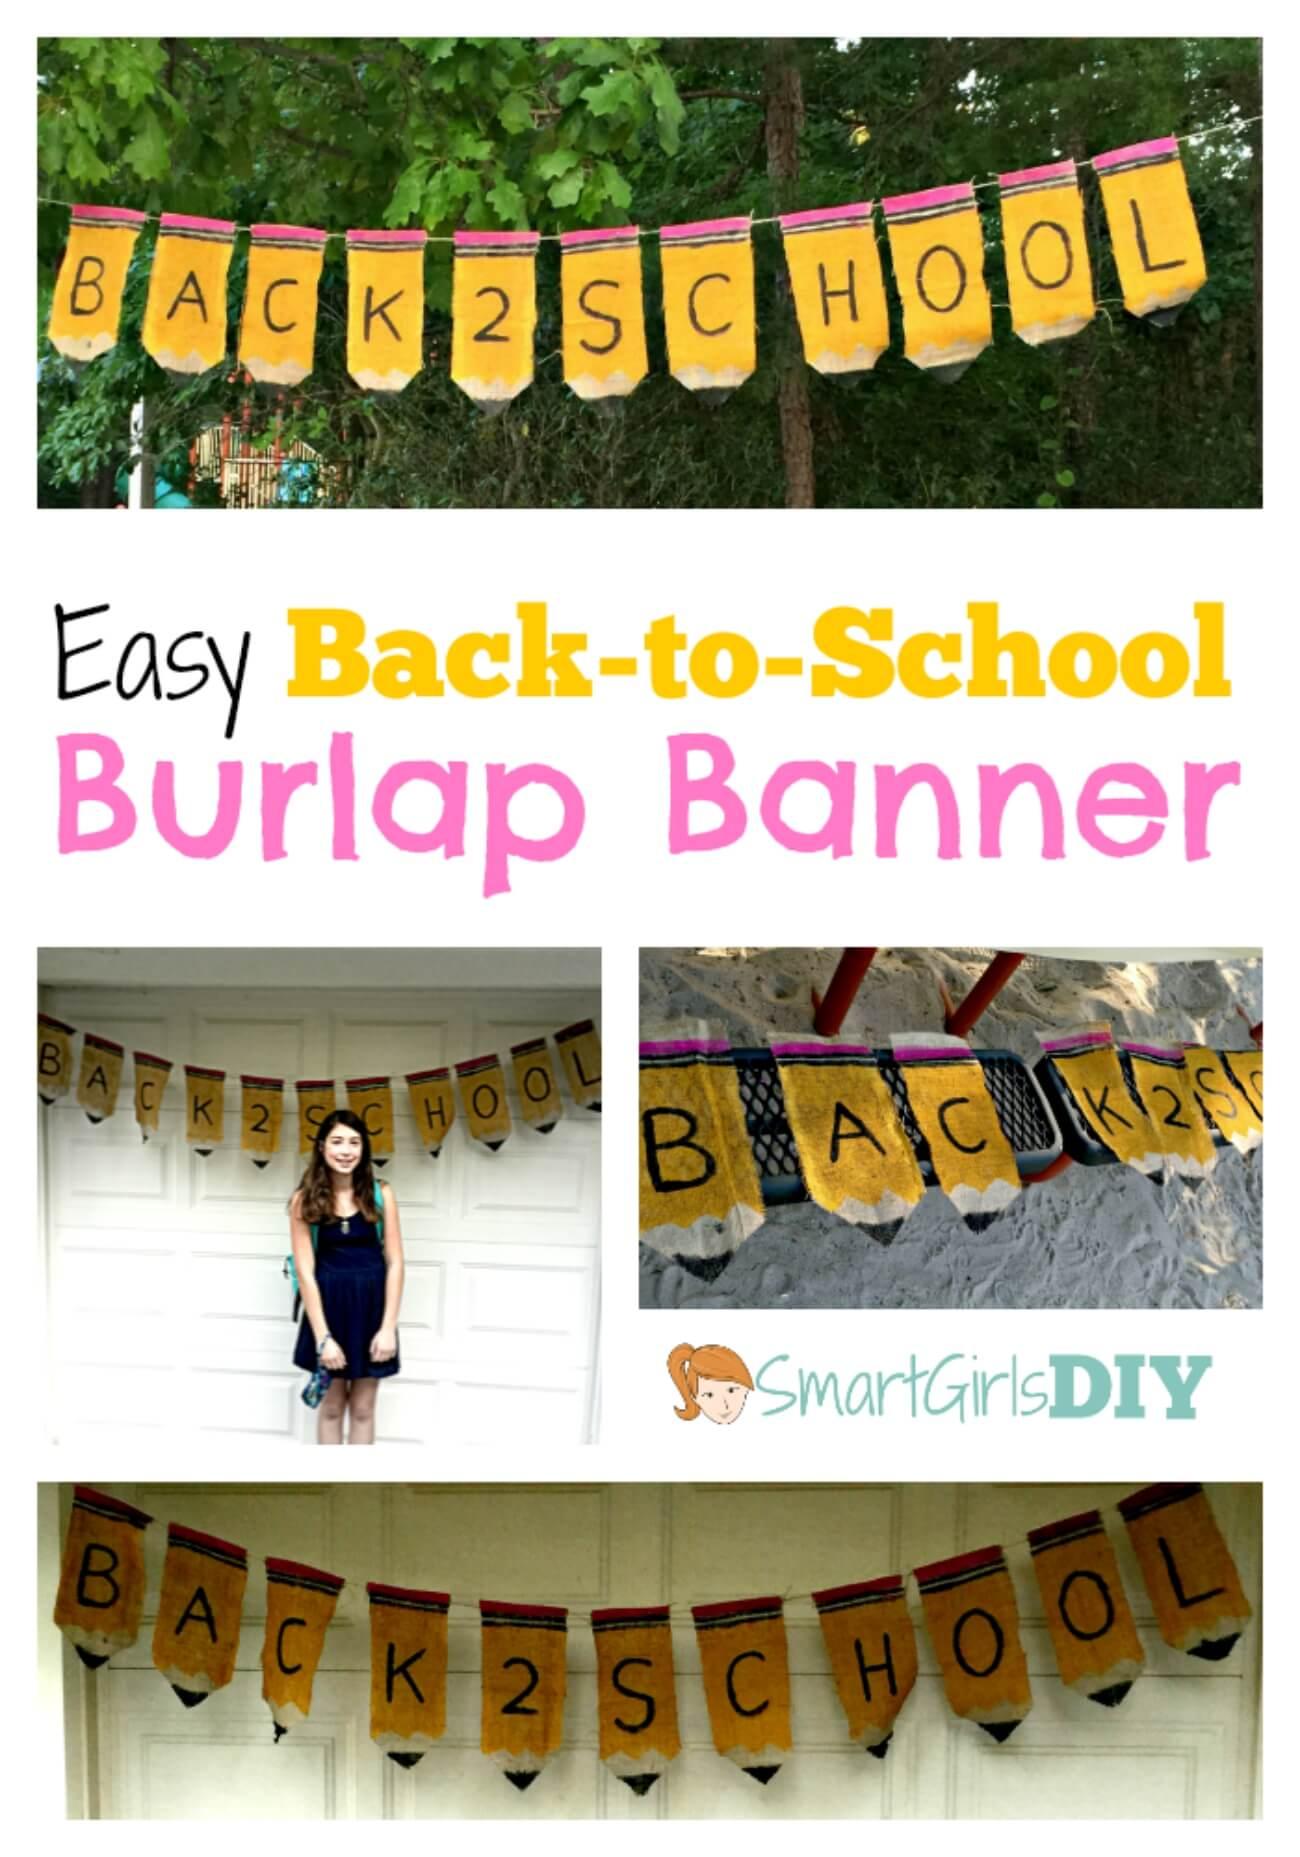 Easy Back-to-School Burlap Banner -- Smart Girls DIY